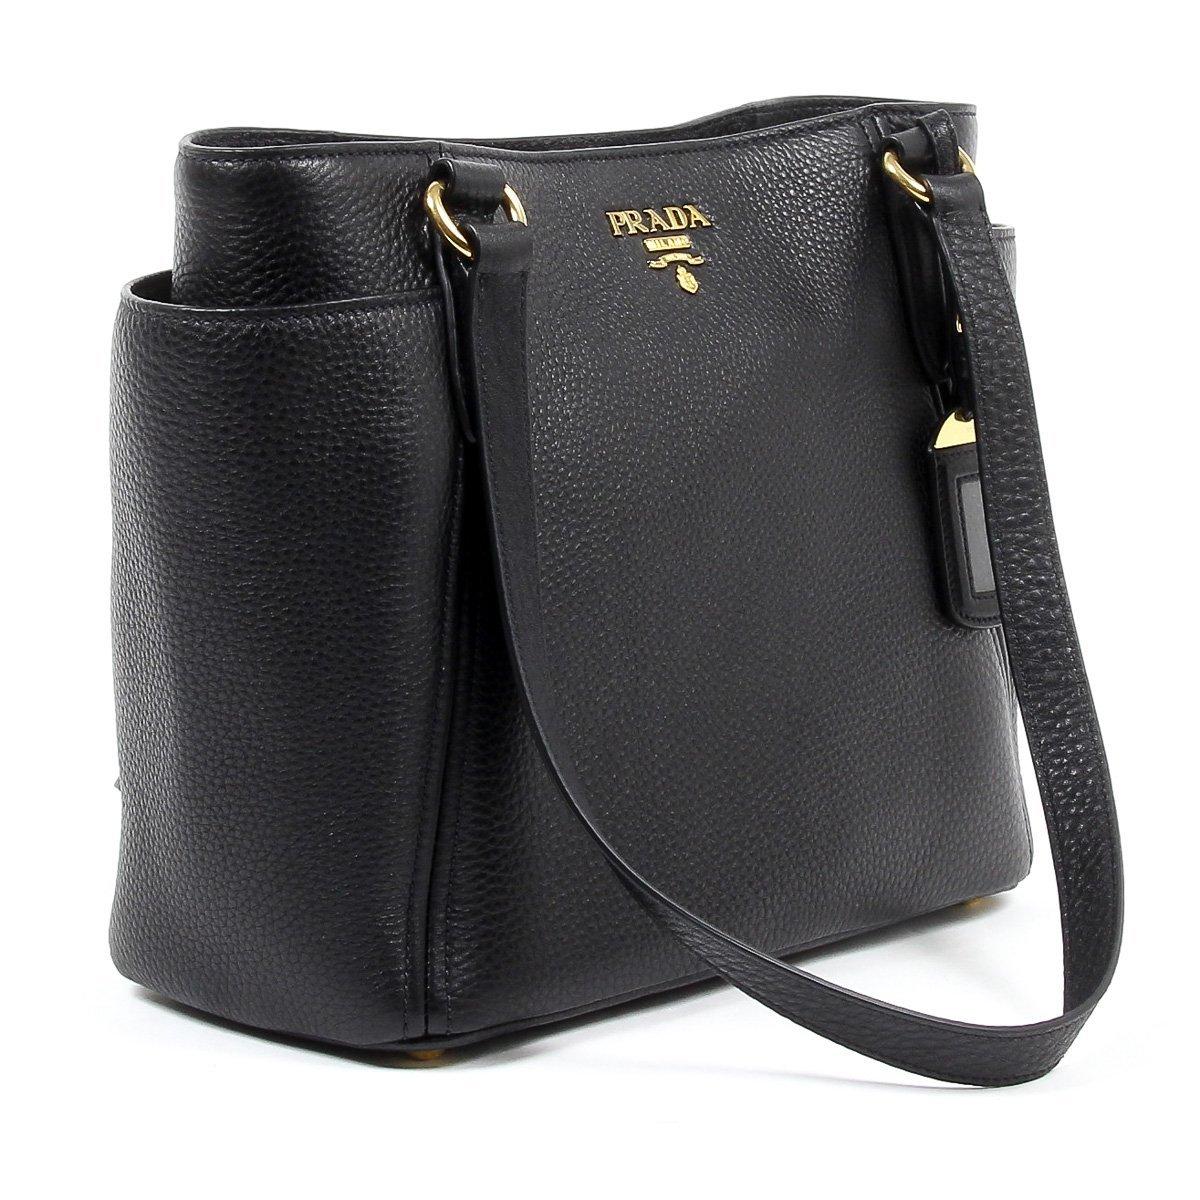 9cb08f739d68 Prada Womens Handbag 1BG113 UWL F0002 NERO VIT DAINO: Amazon.co.uk: Shoes &  Bags